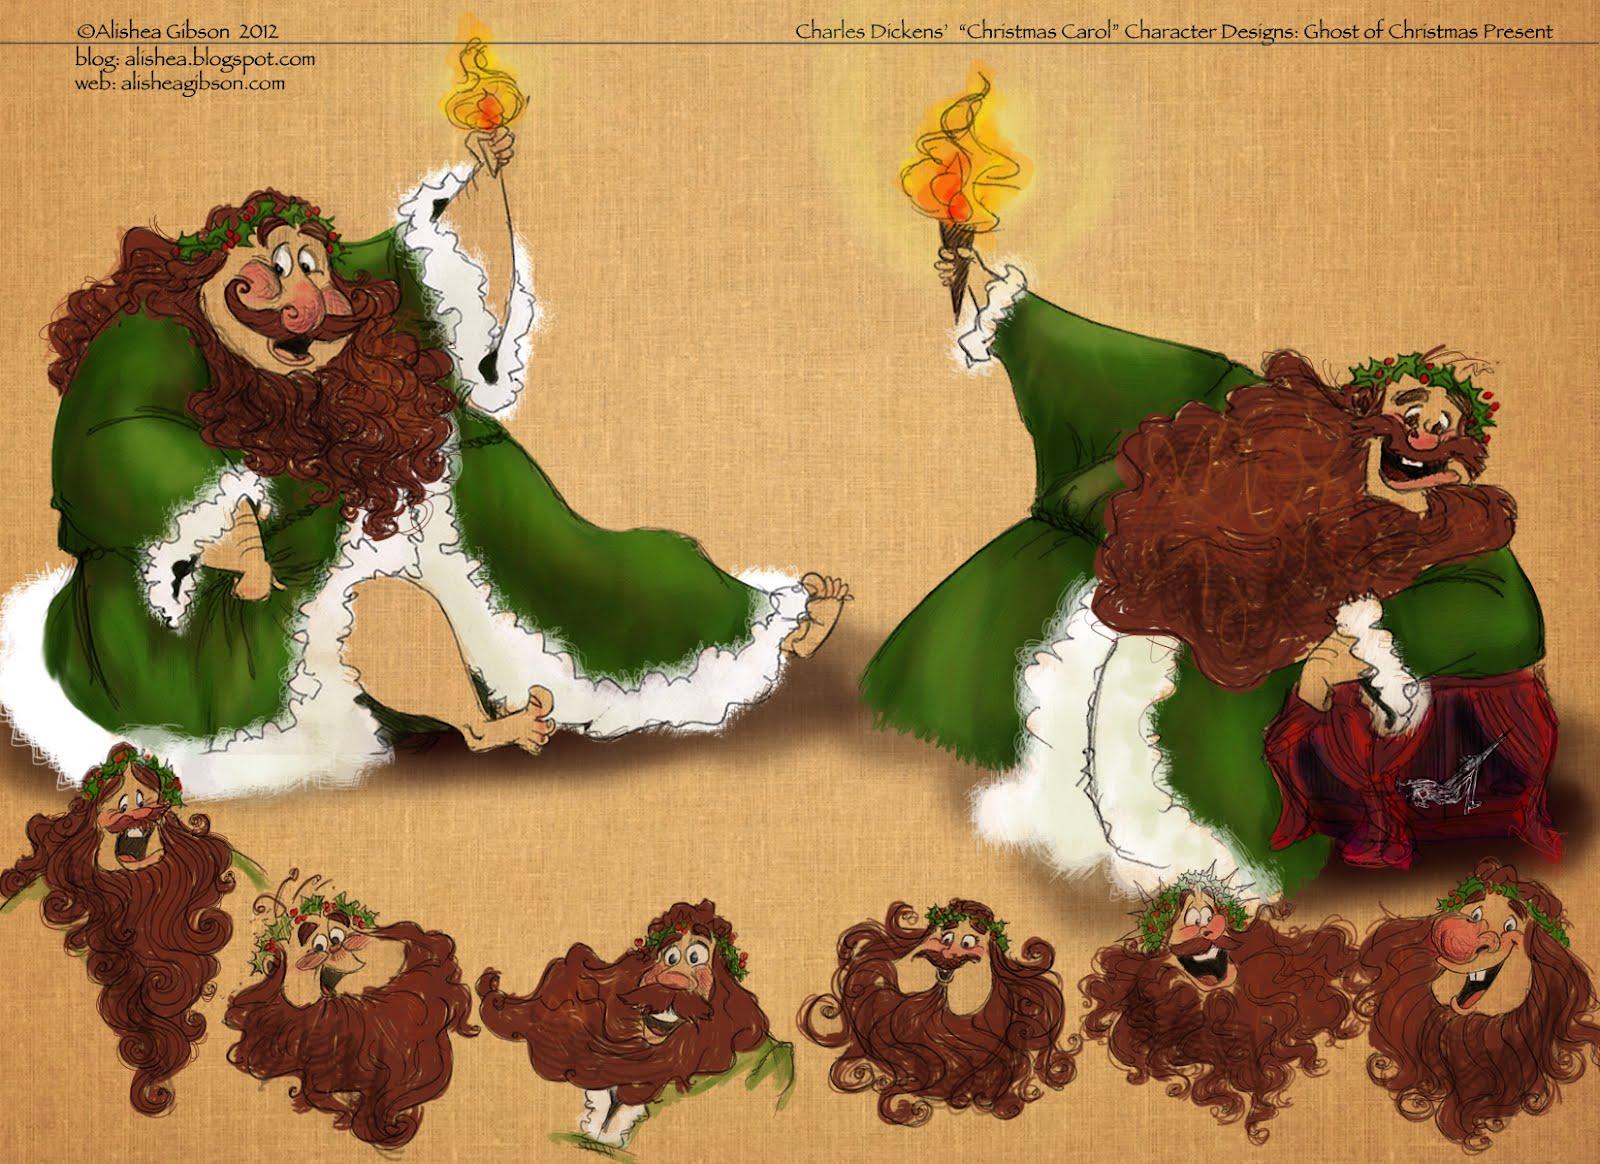 Art of Alishea Gibson: A Christmas Carol Character Designs